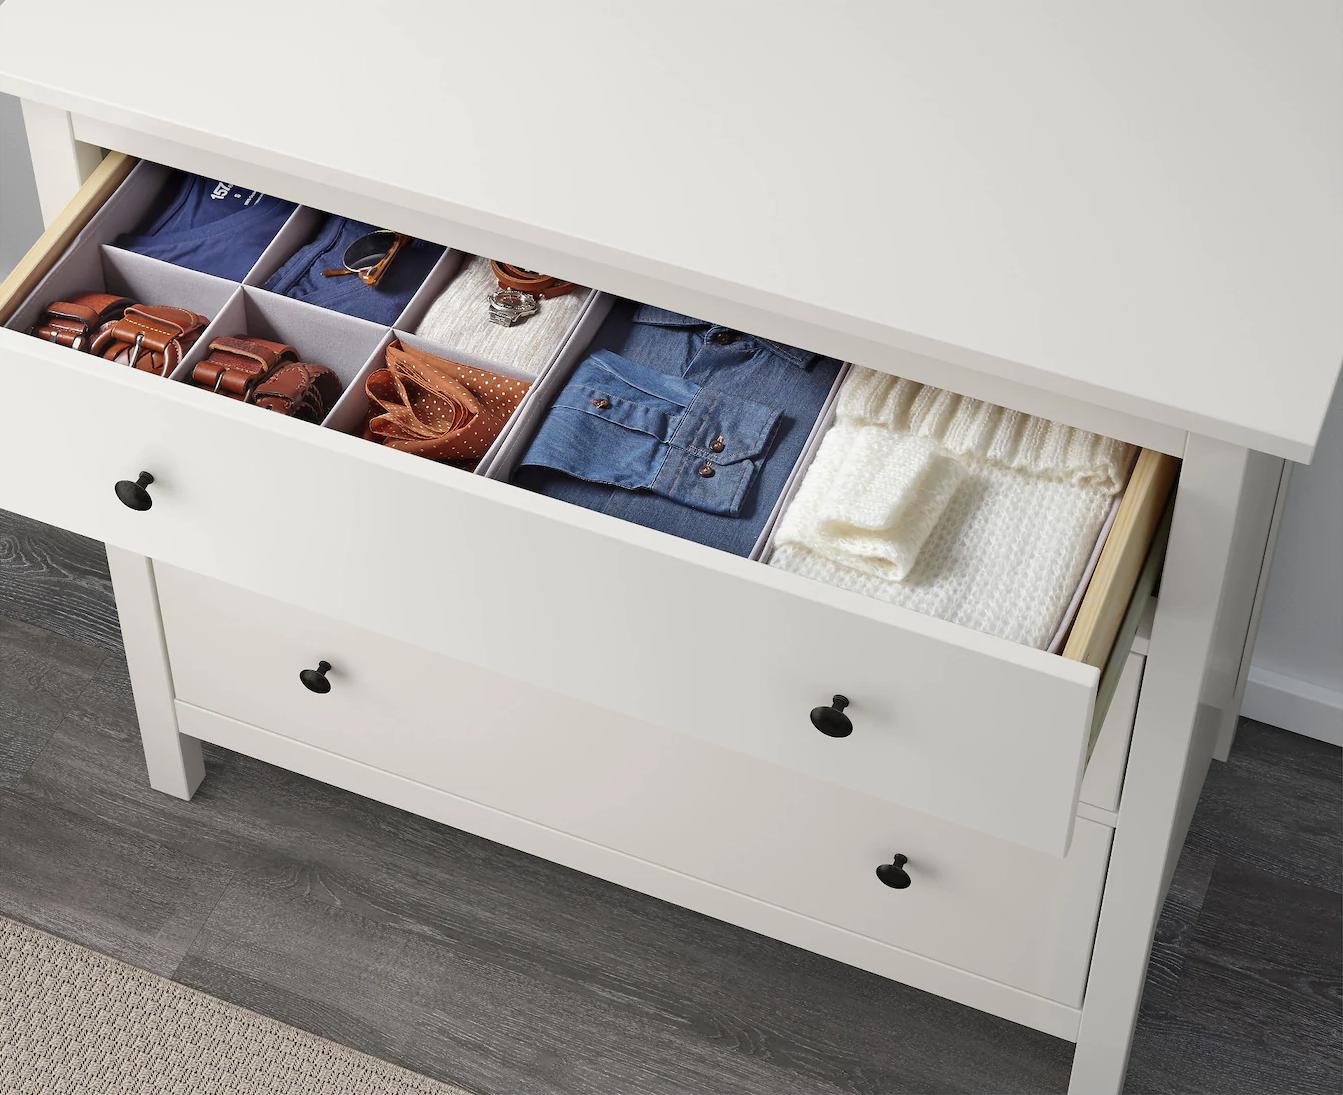 Organizadores para cajones. De Ikea.